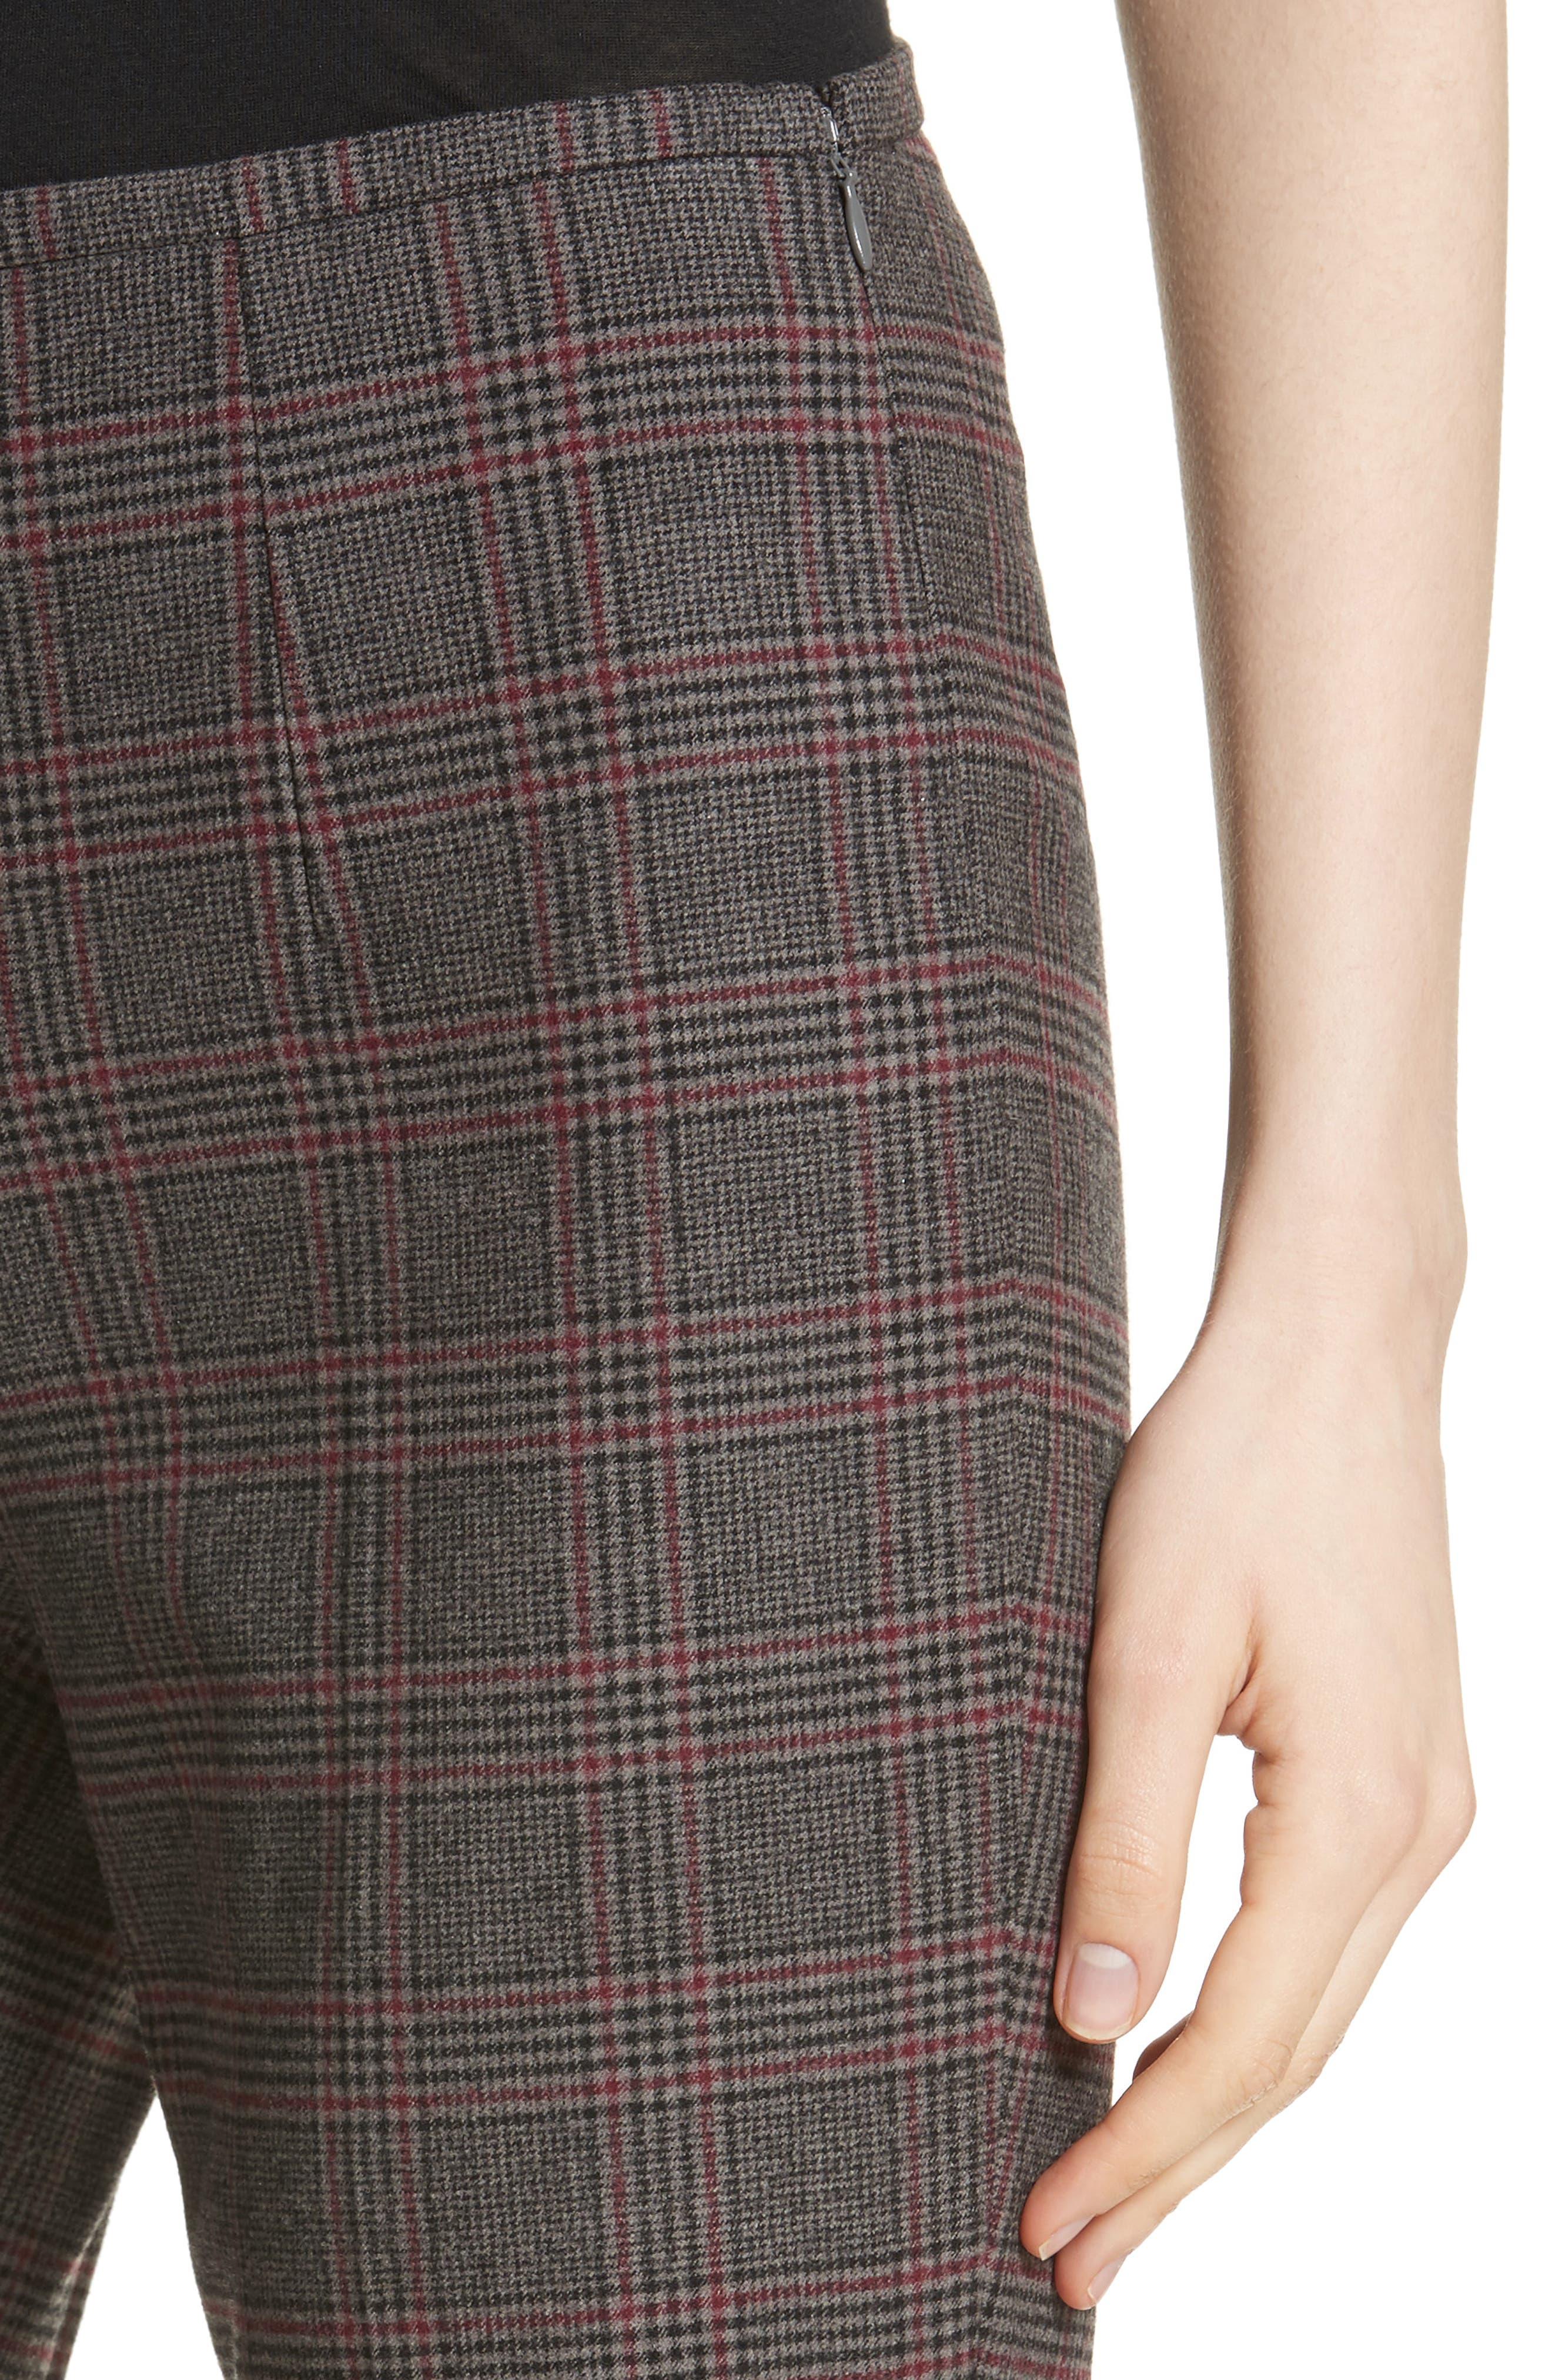 MICHAEL KORS,                             Plaid Stretch Wool Flannel Pants,                             Alternate thumbnail 4, color,                             034